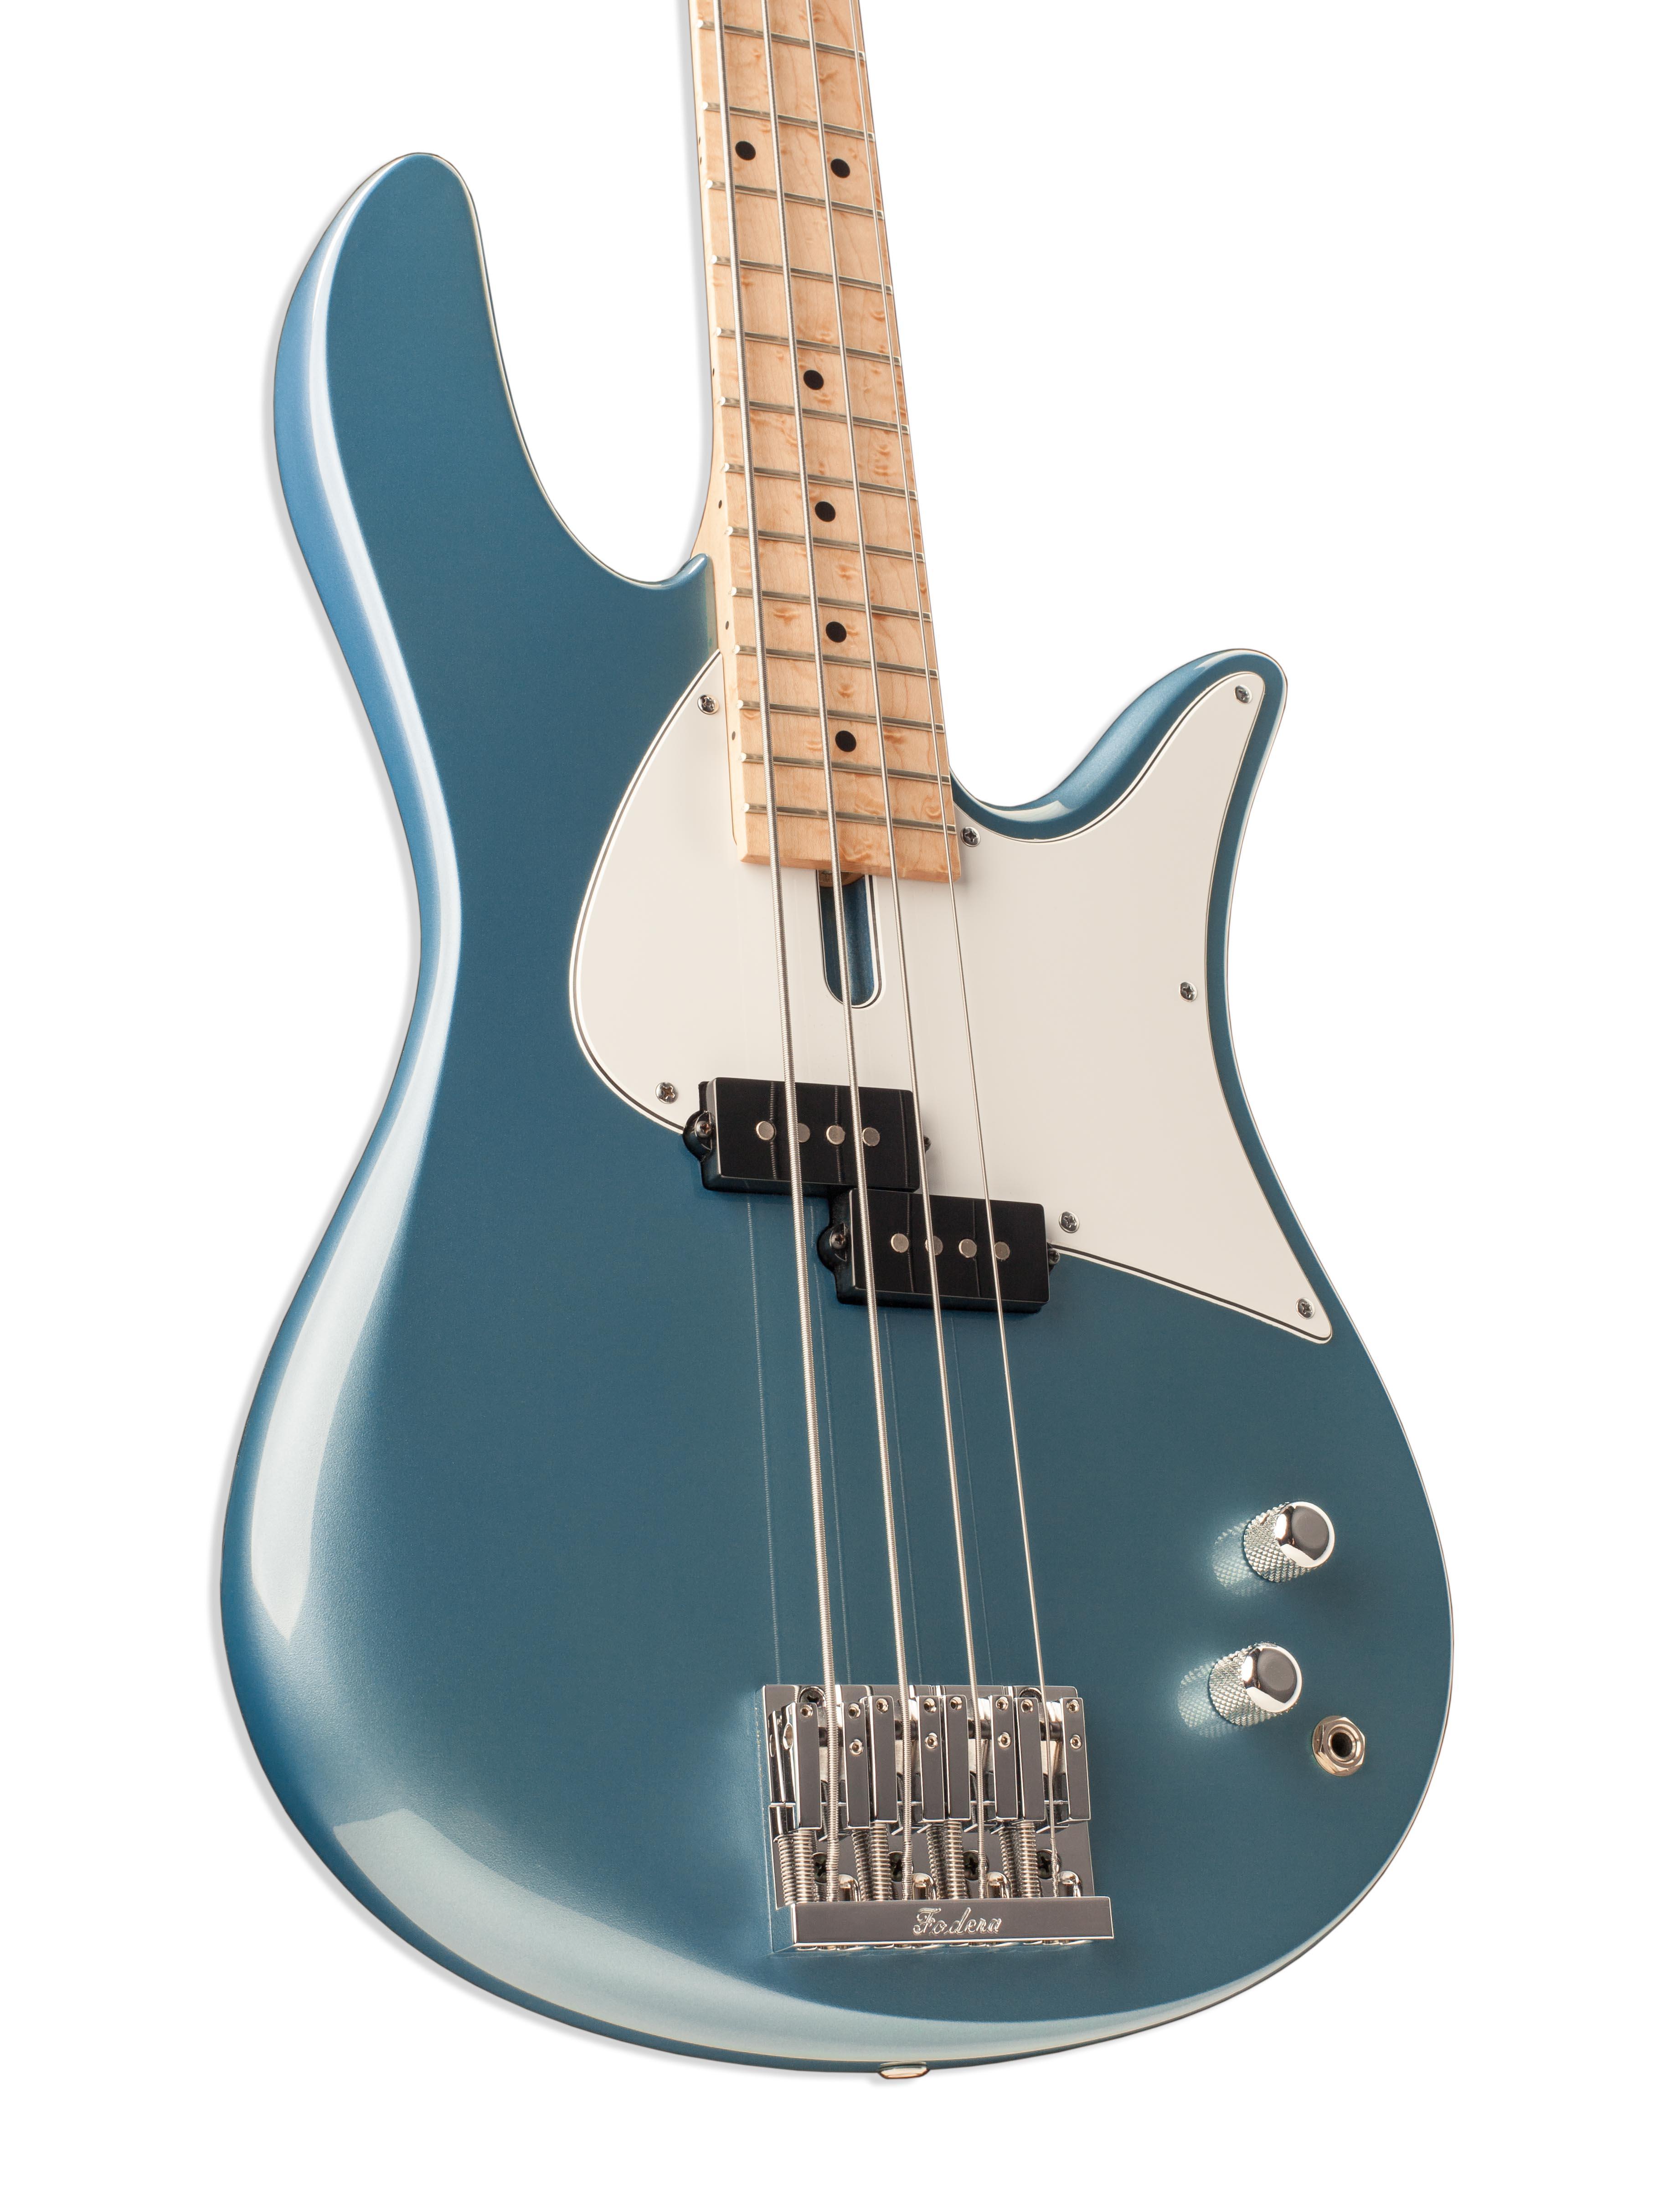 Four-String Seafoam Bass Guitar Body Closeup